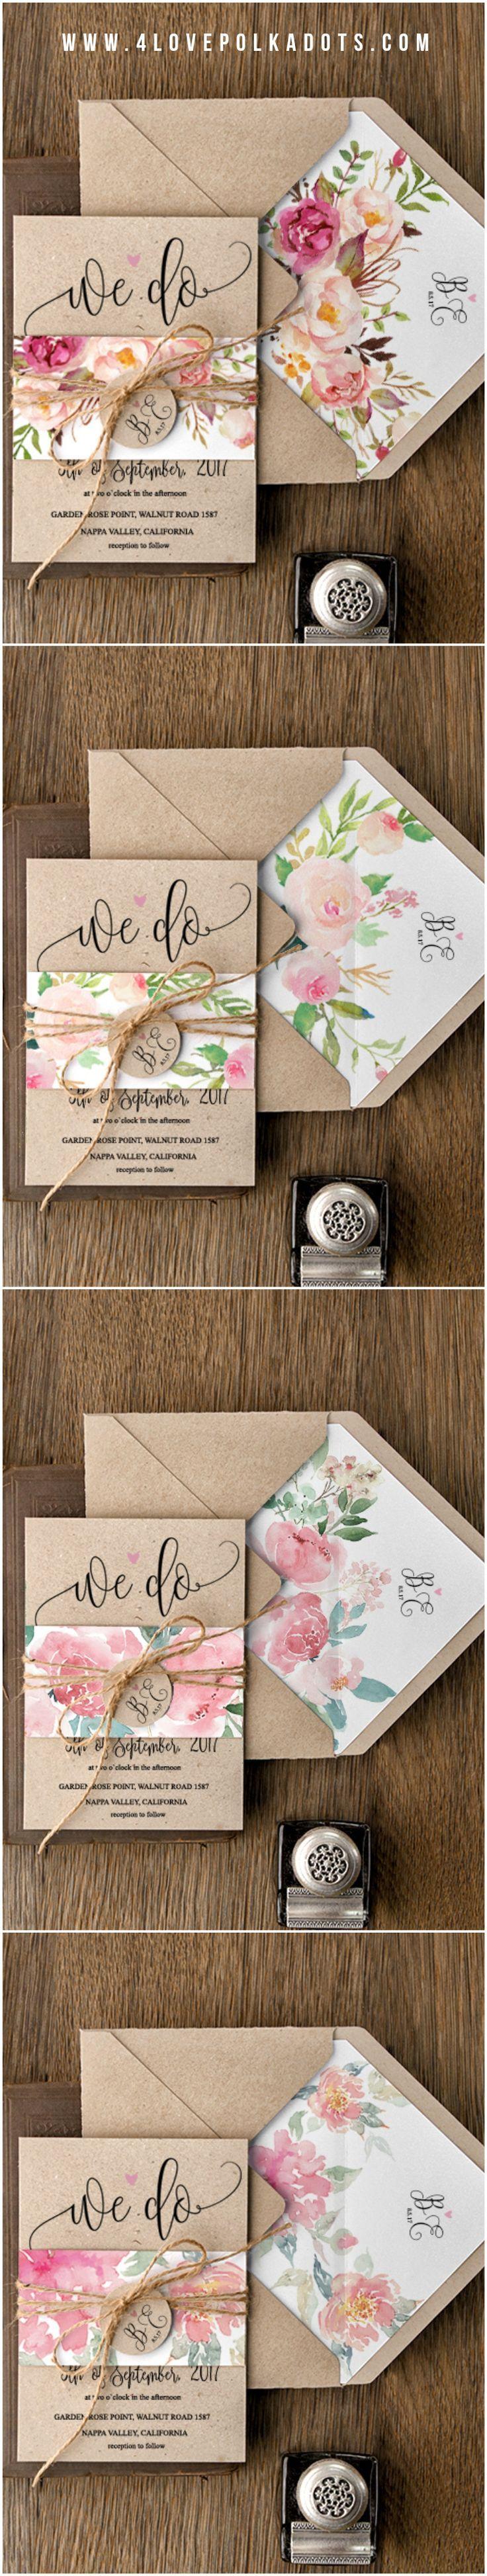 Keep this website most inexpensive invites iuve found wedding